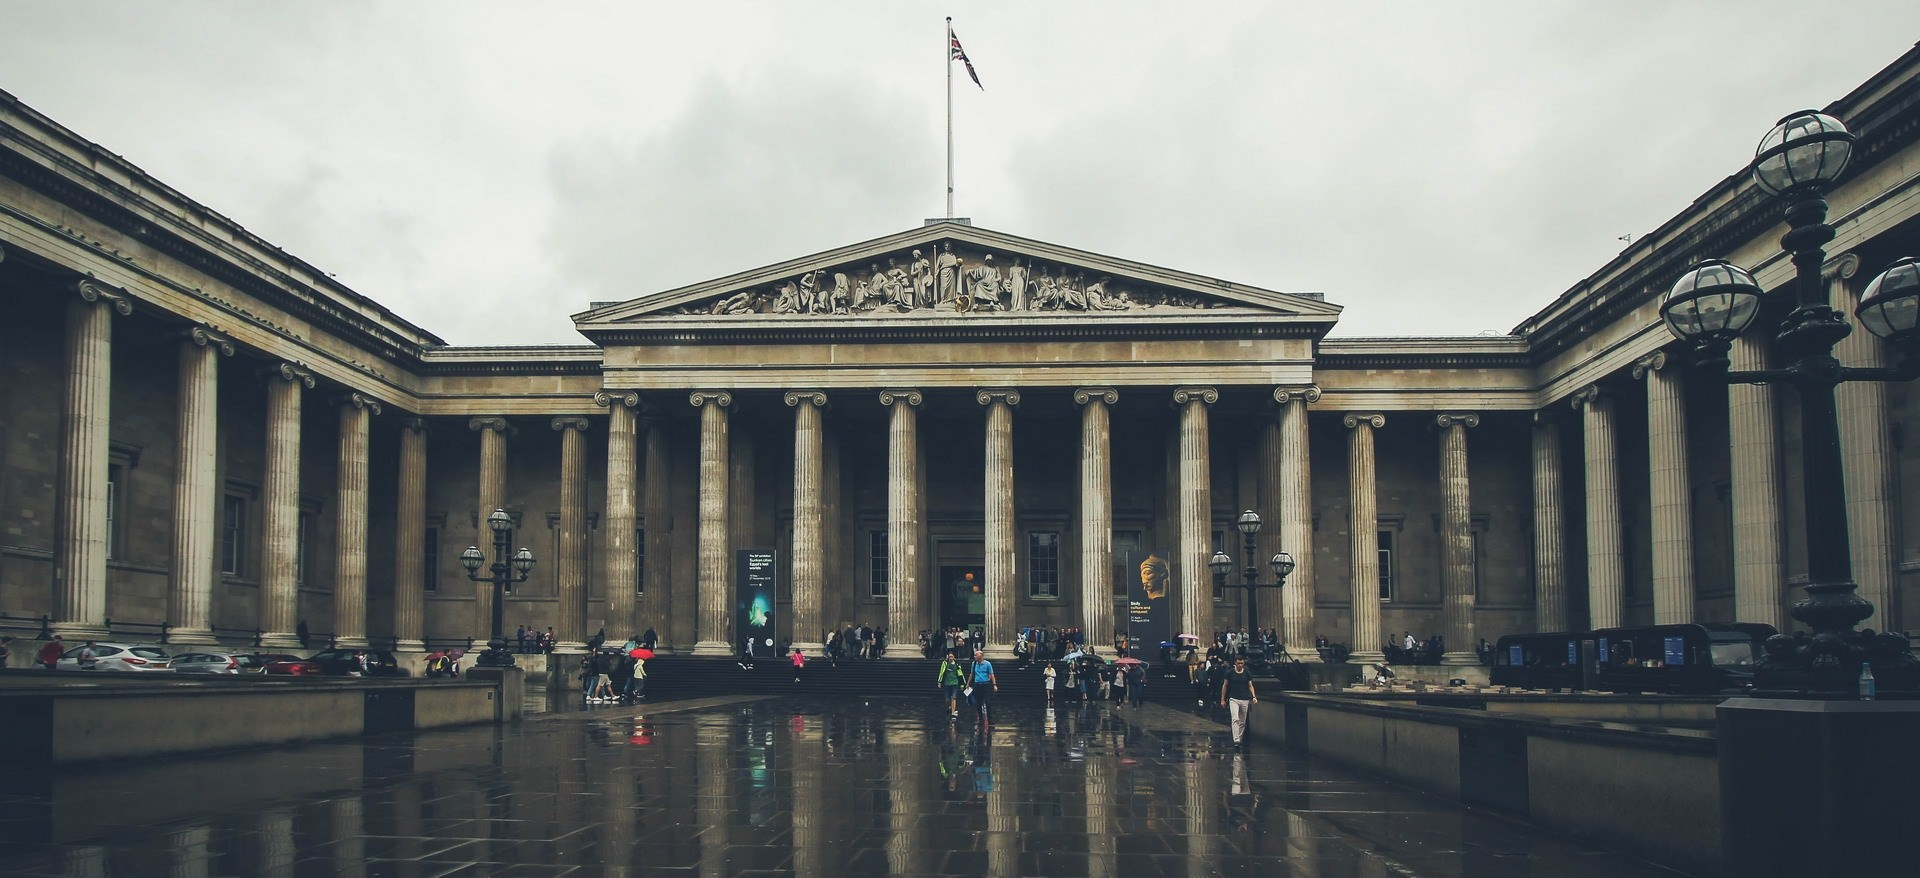 Британский музей. Photo: Tamara Menzi | Unsplash